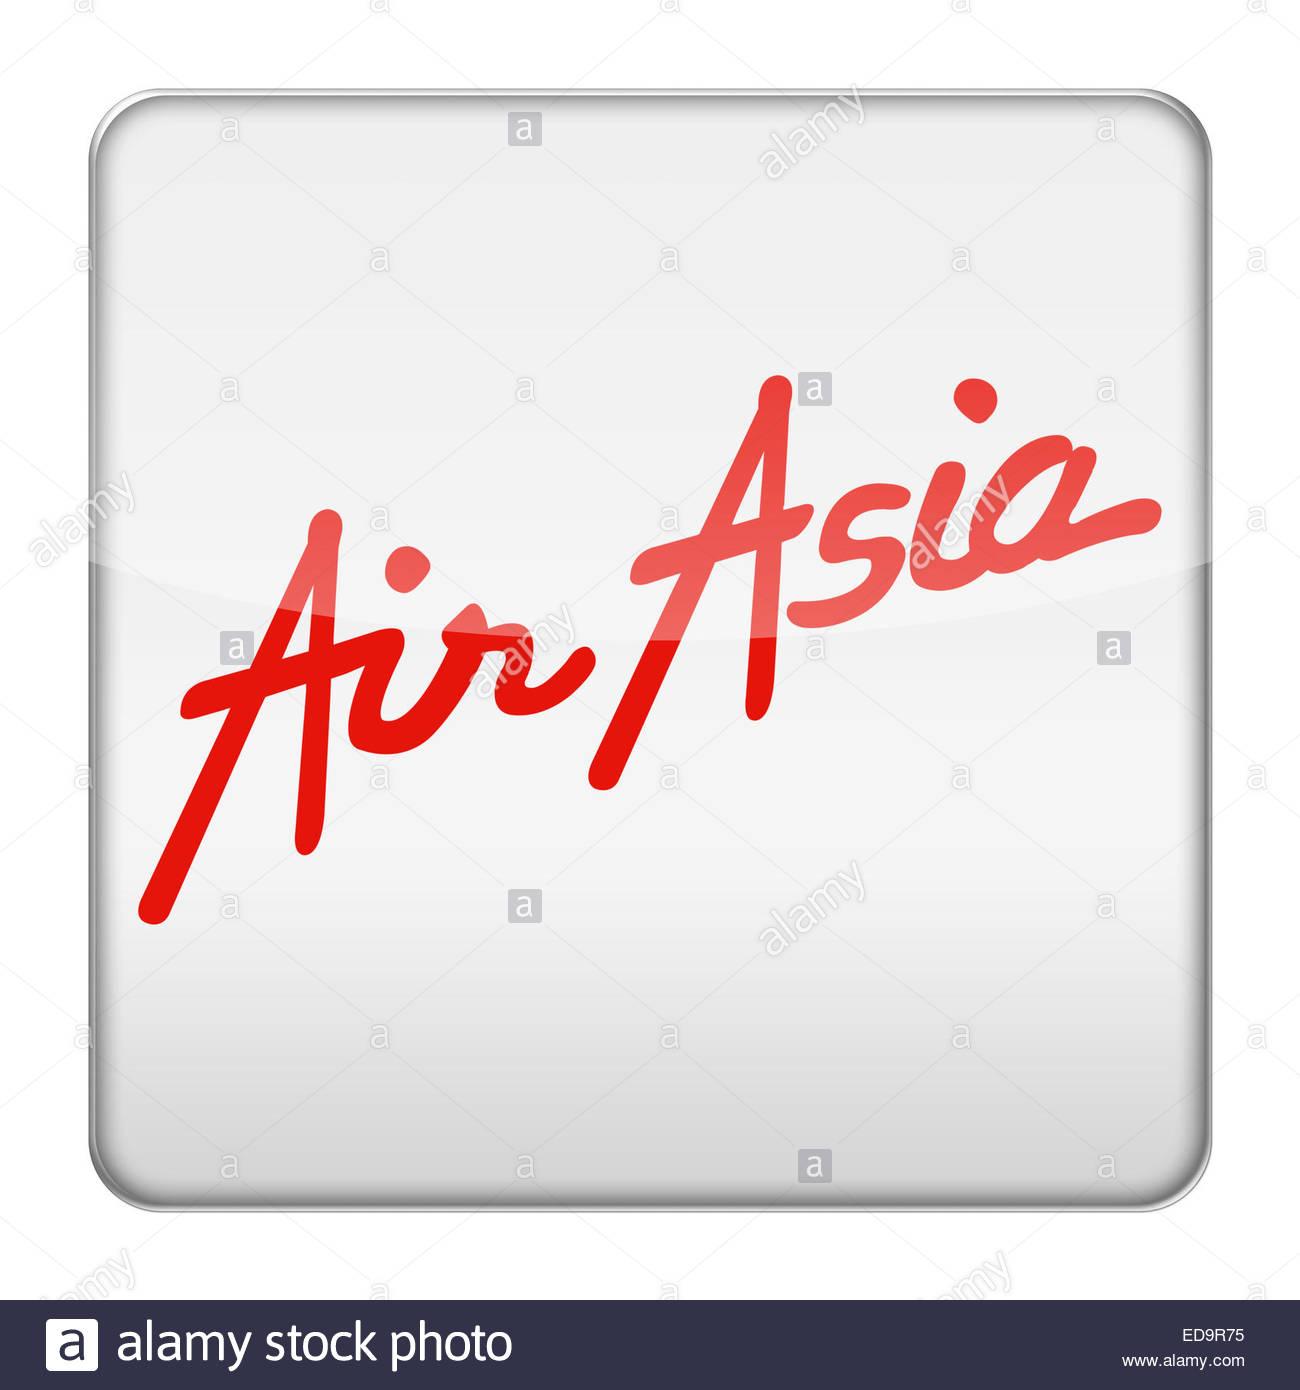 AirAsia Malaysian Airline logo icon - Stock Image